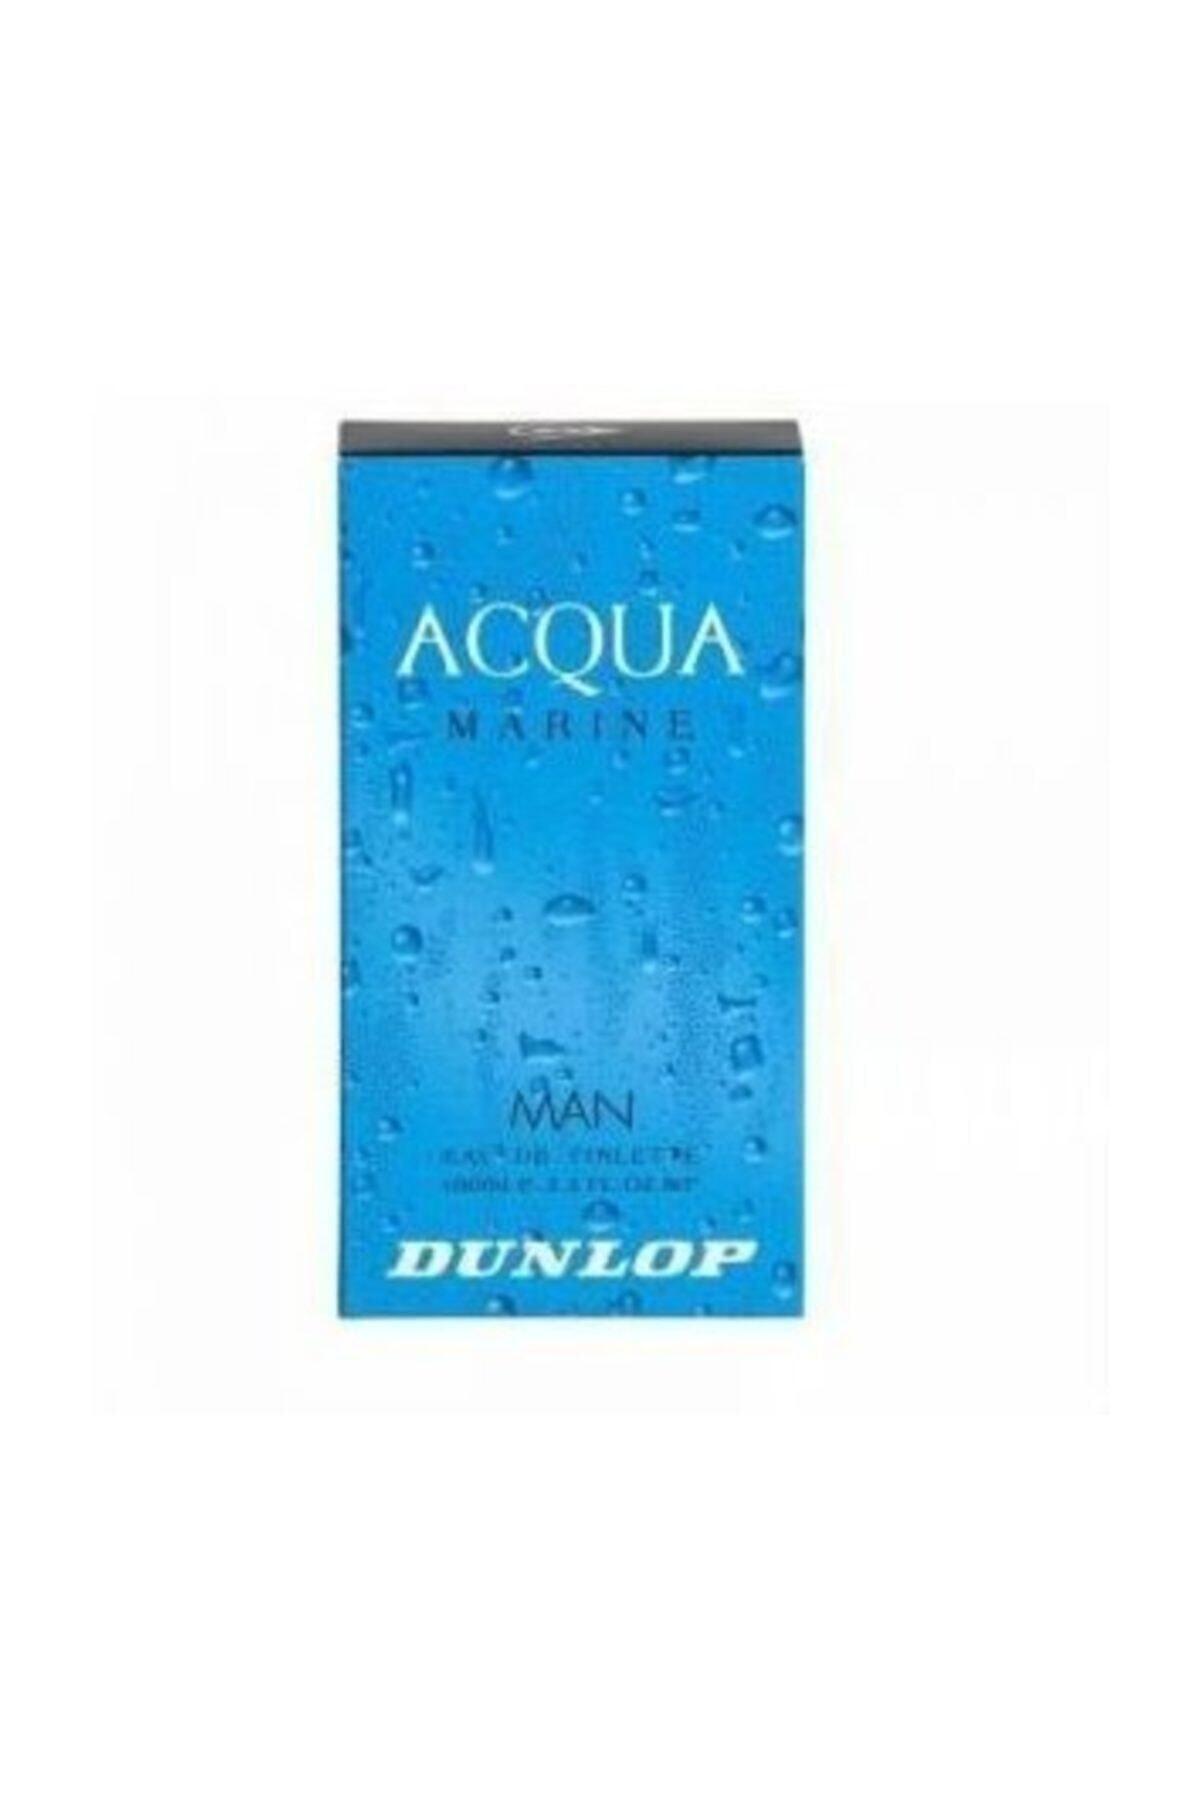 DUNLOP Acqua Edt Marine Erkek Edt 100 ml Parfüm 8690587008906 1